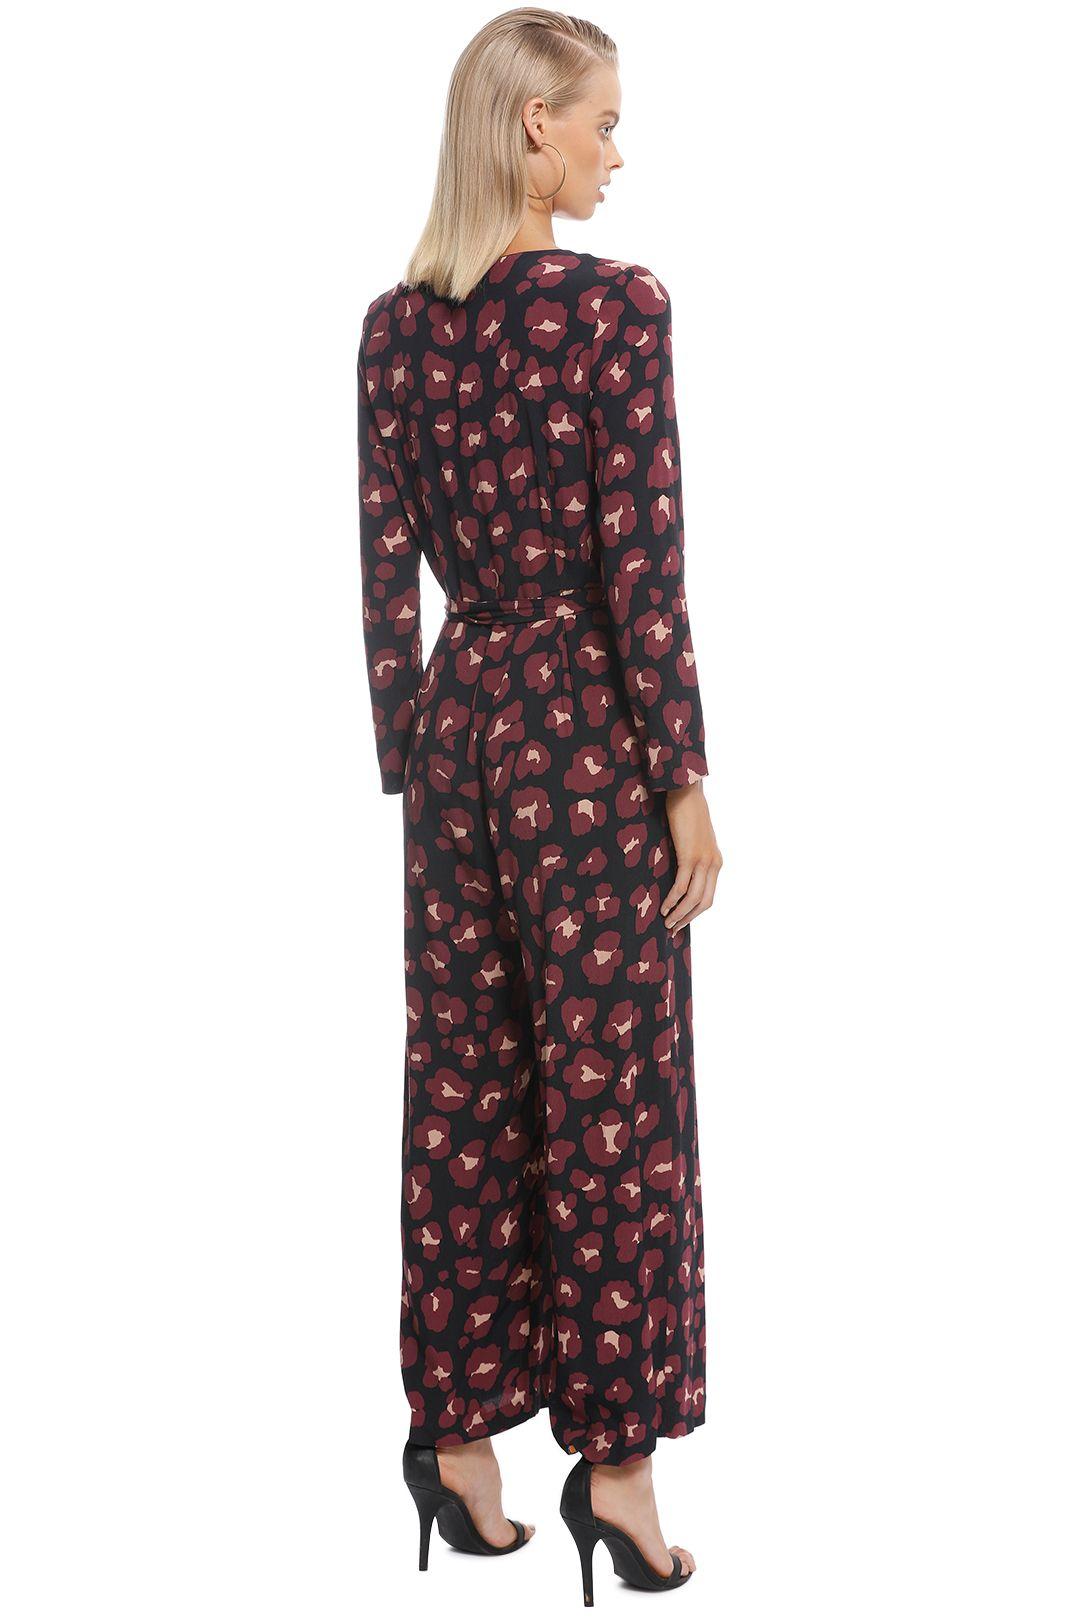 Gorman - Leopard Print Pantsuit - Print - Back